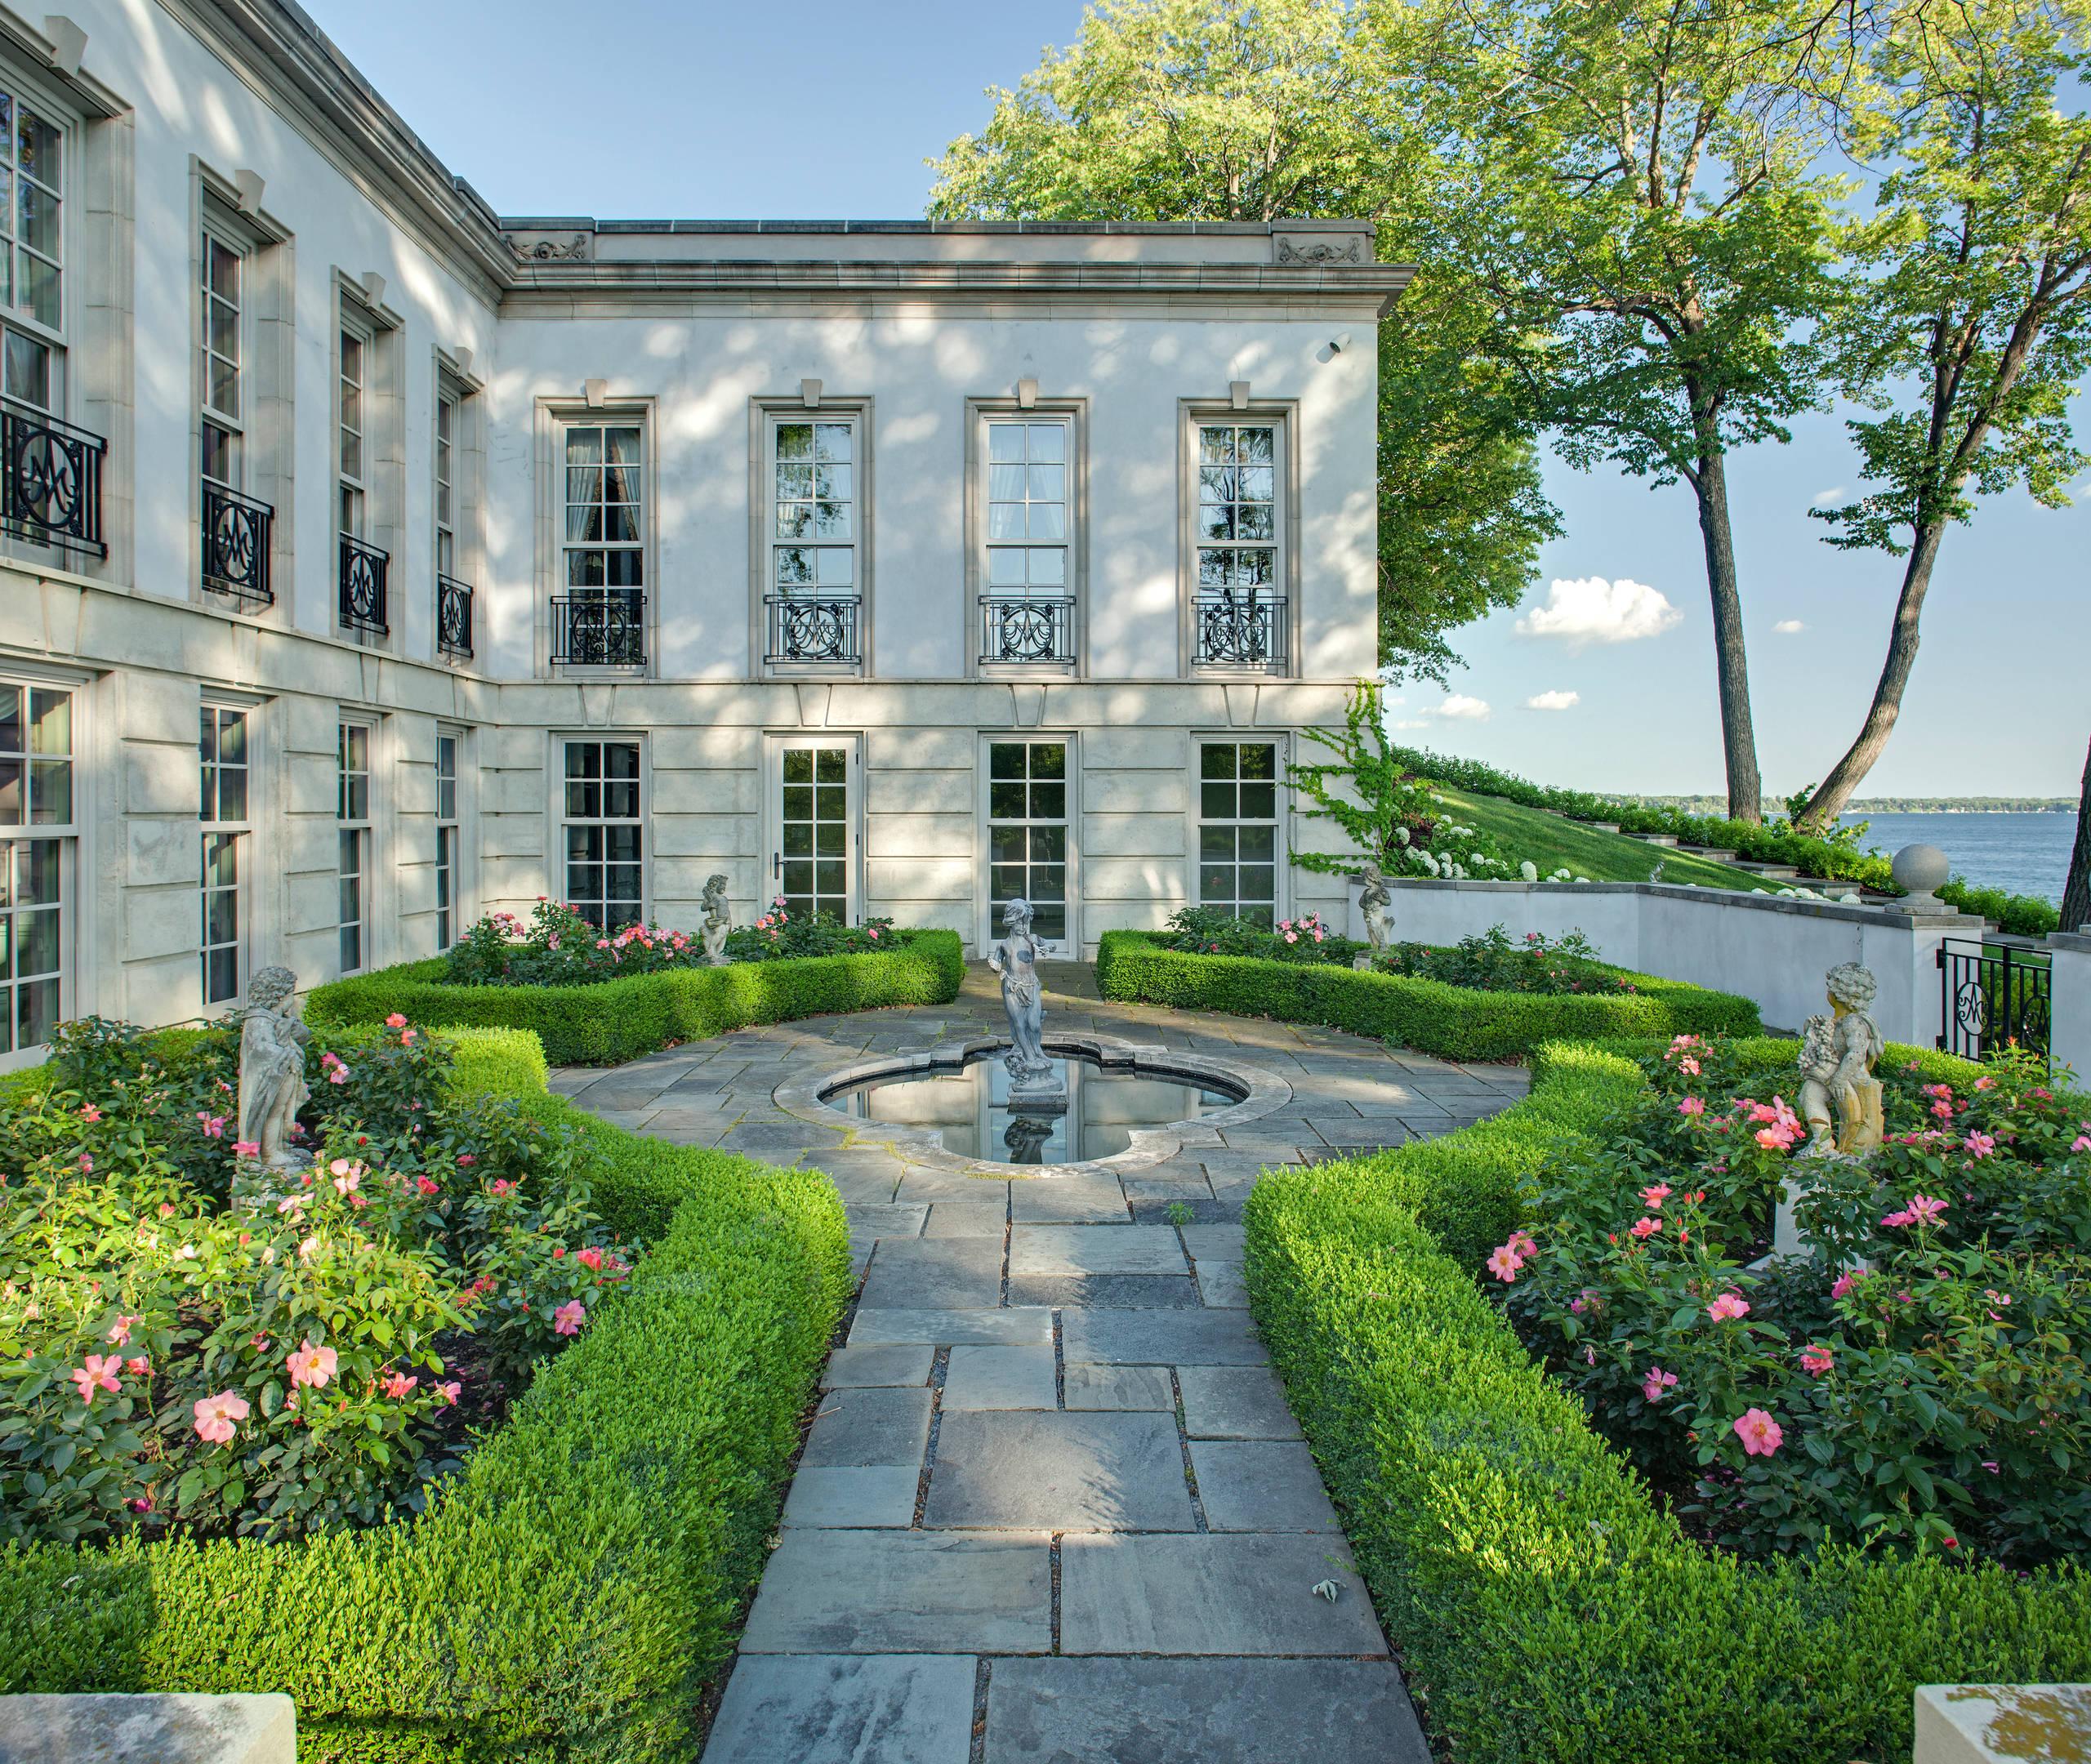 Landscape Garden Design: 15 Refreshing Mediterranean Landscape Designs For A